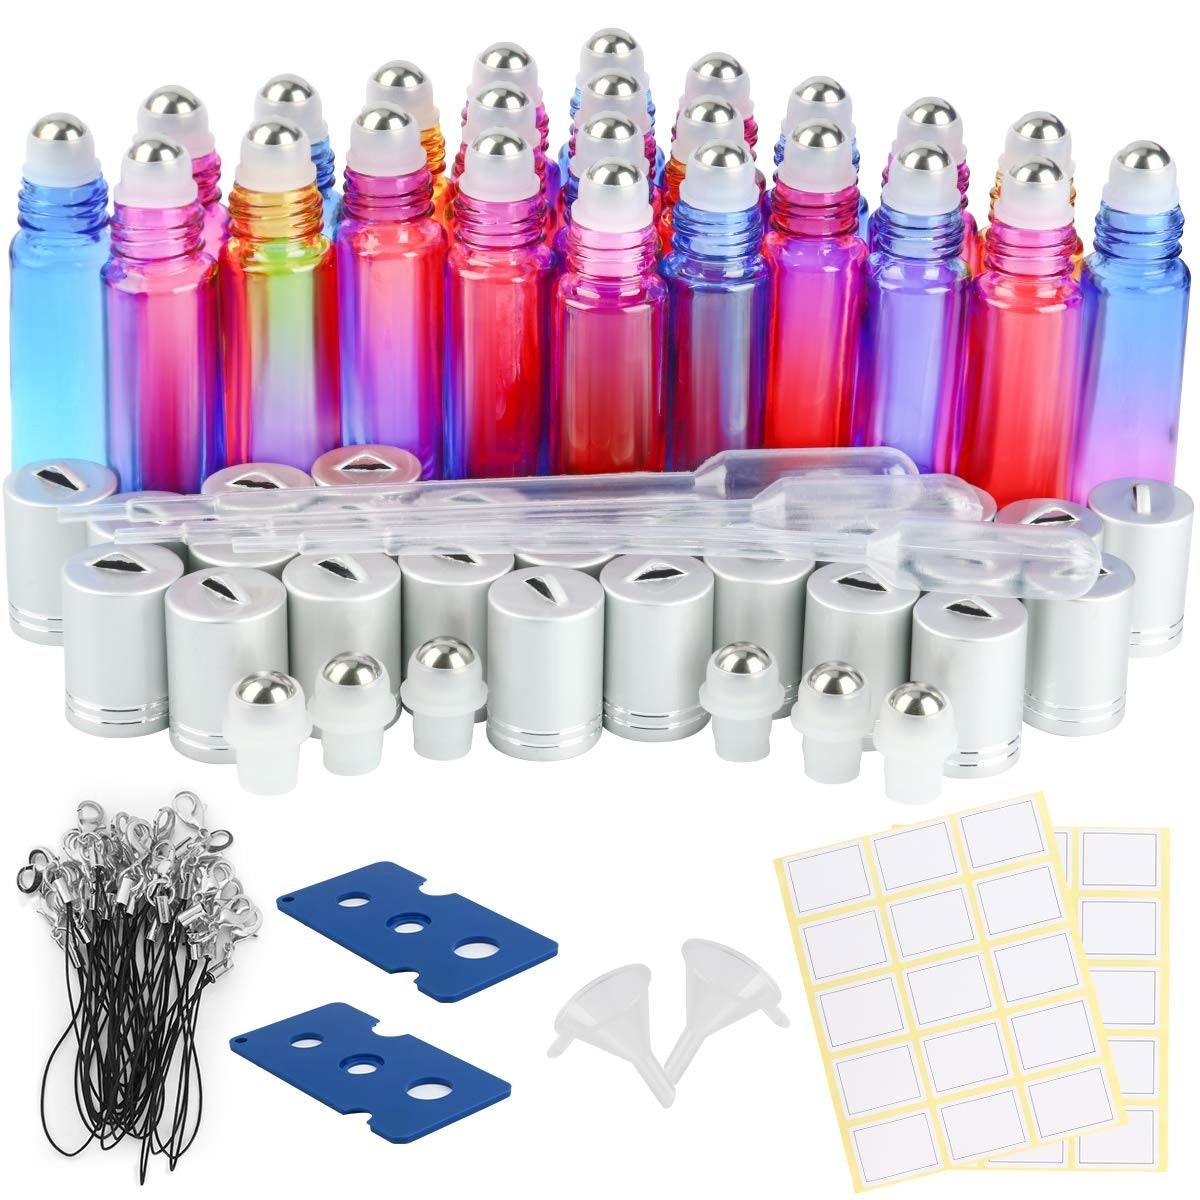 ESARORA Essential Oil Roller Bottles (24-Pack)